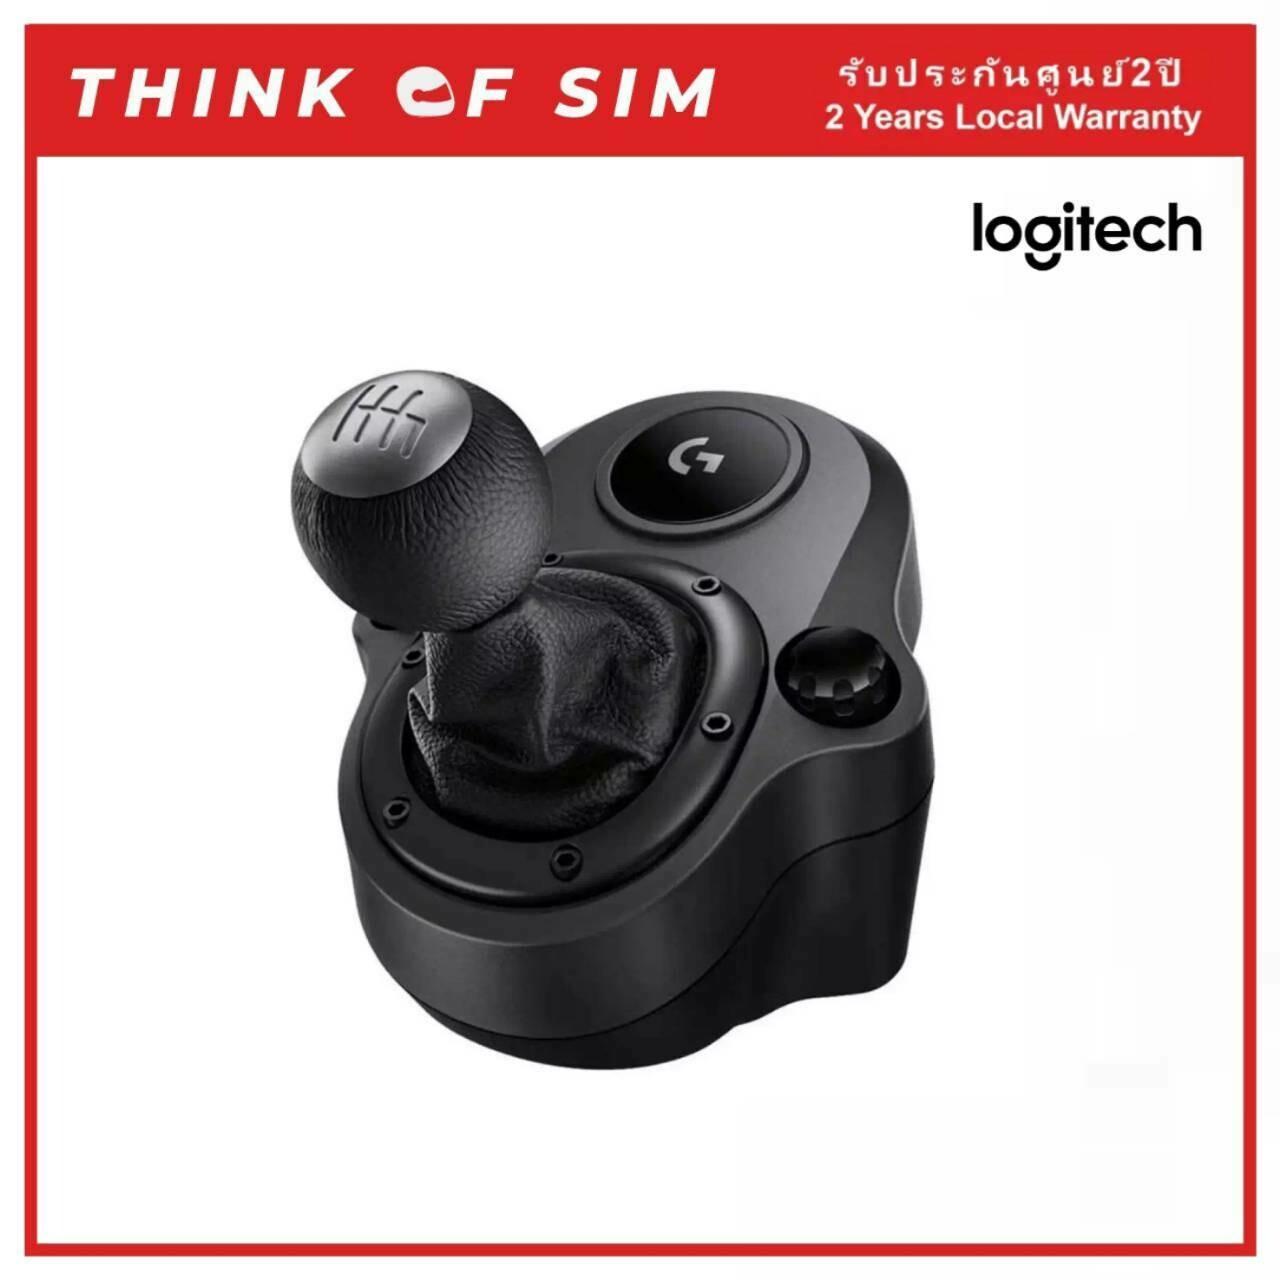 Logitech G Driving Force Shifter For Sim Racing